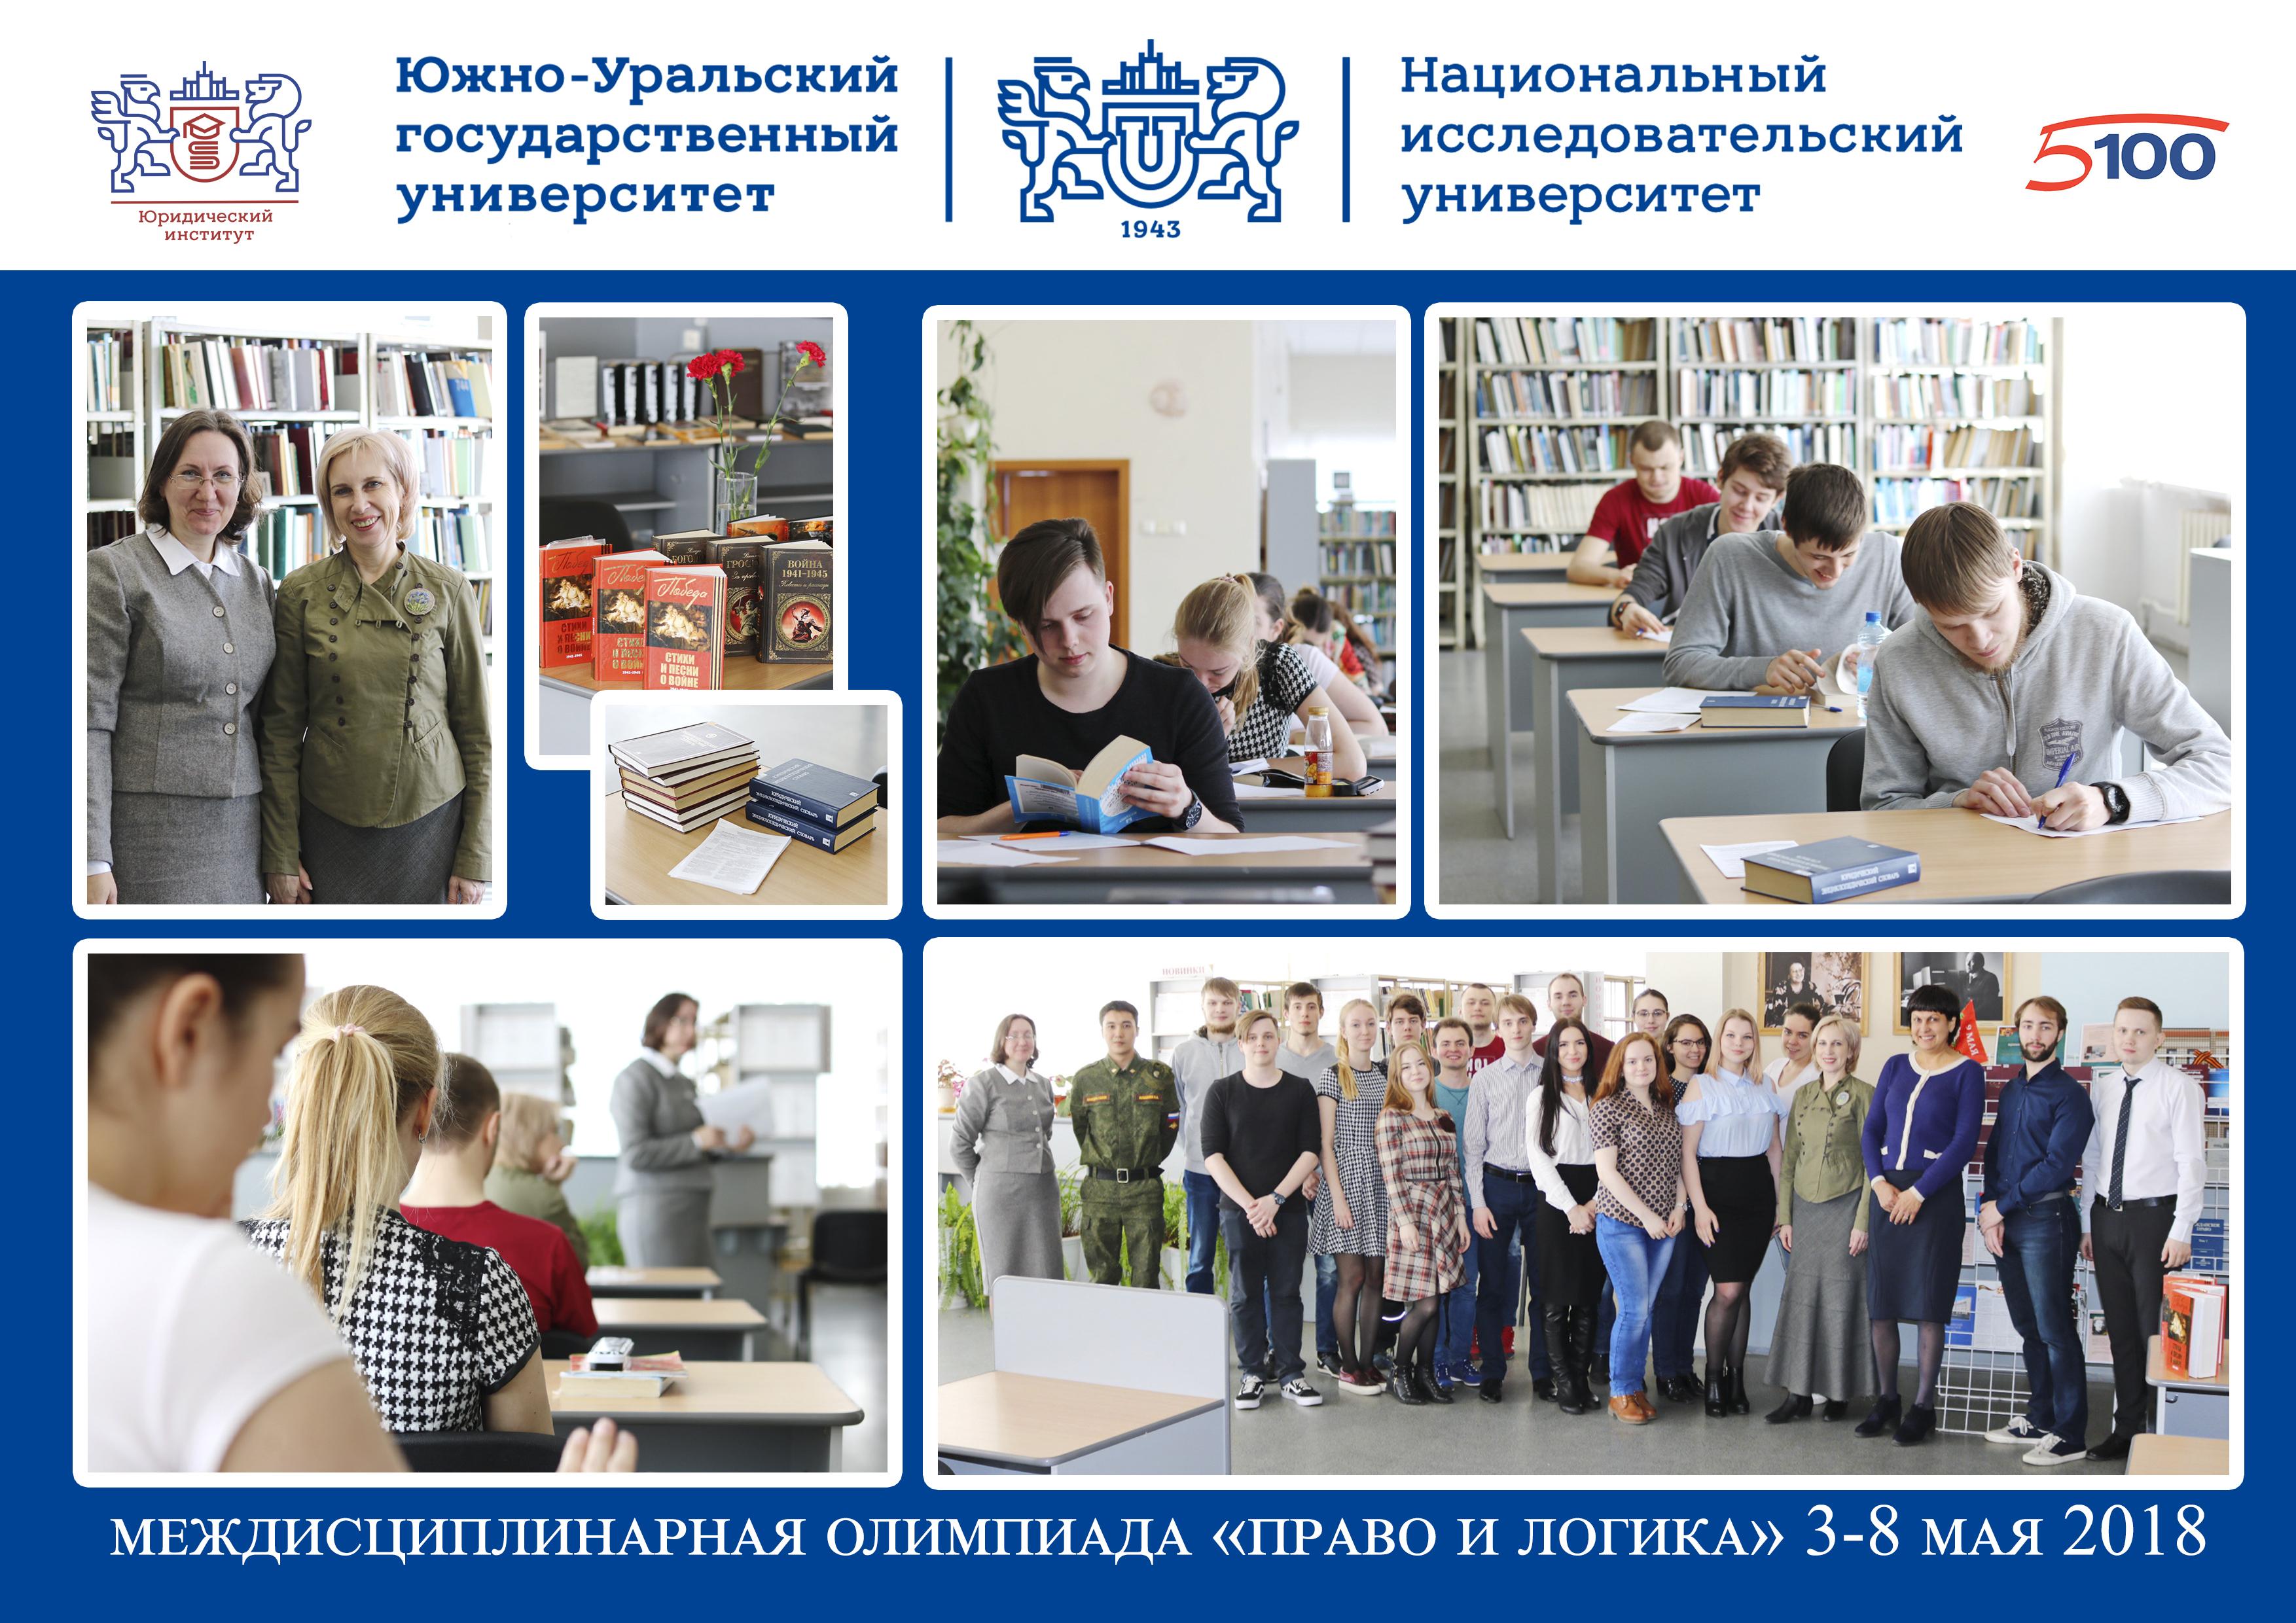 http://law.susu.ru/wp-content/uploads/2018/05/olimpiada-Grazhdanskoe-pravo-i-logika.jpg